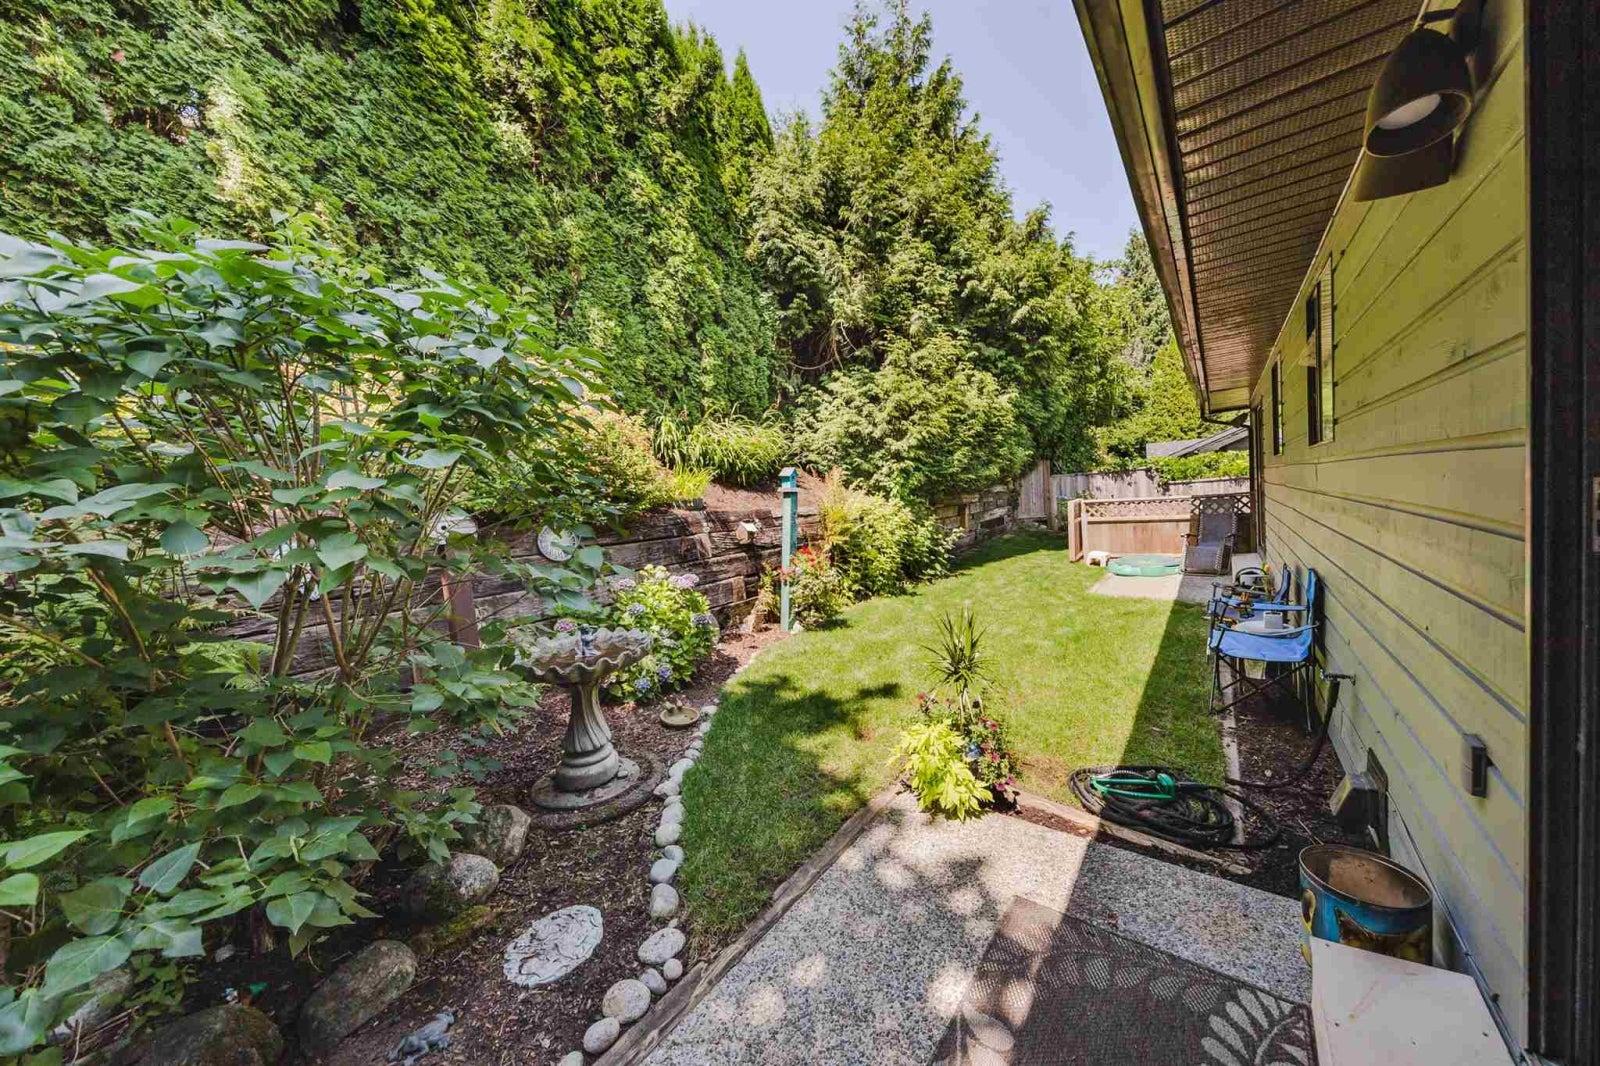 843 REDDINGTON COURT - Ranch Park House/Single Family for sale, 5 Bedrooms (R2602360) #28